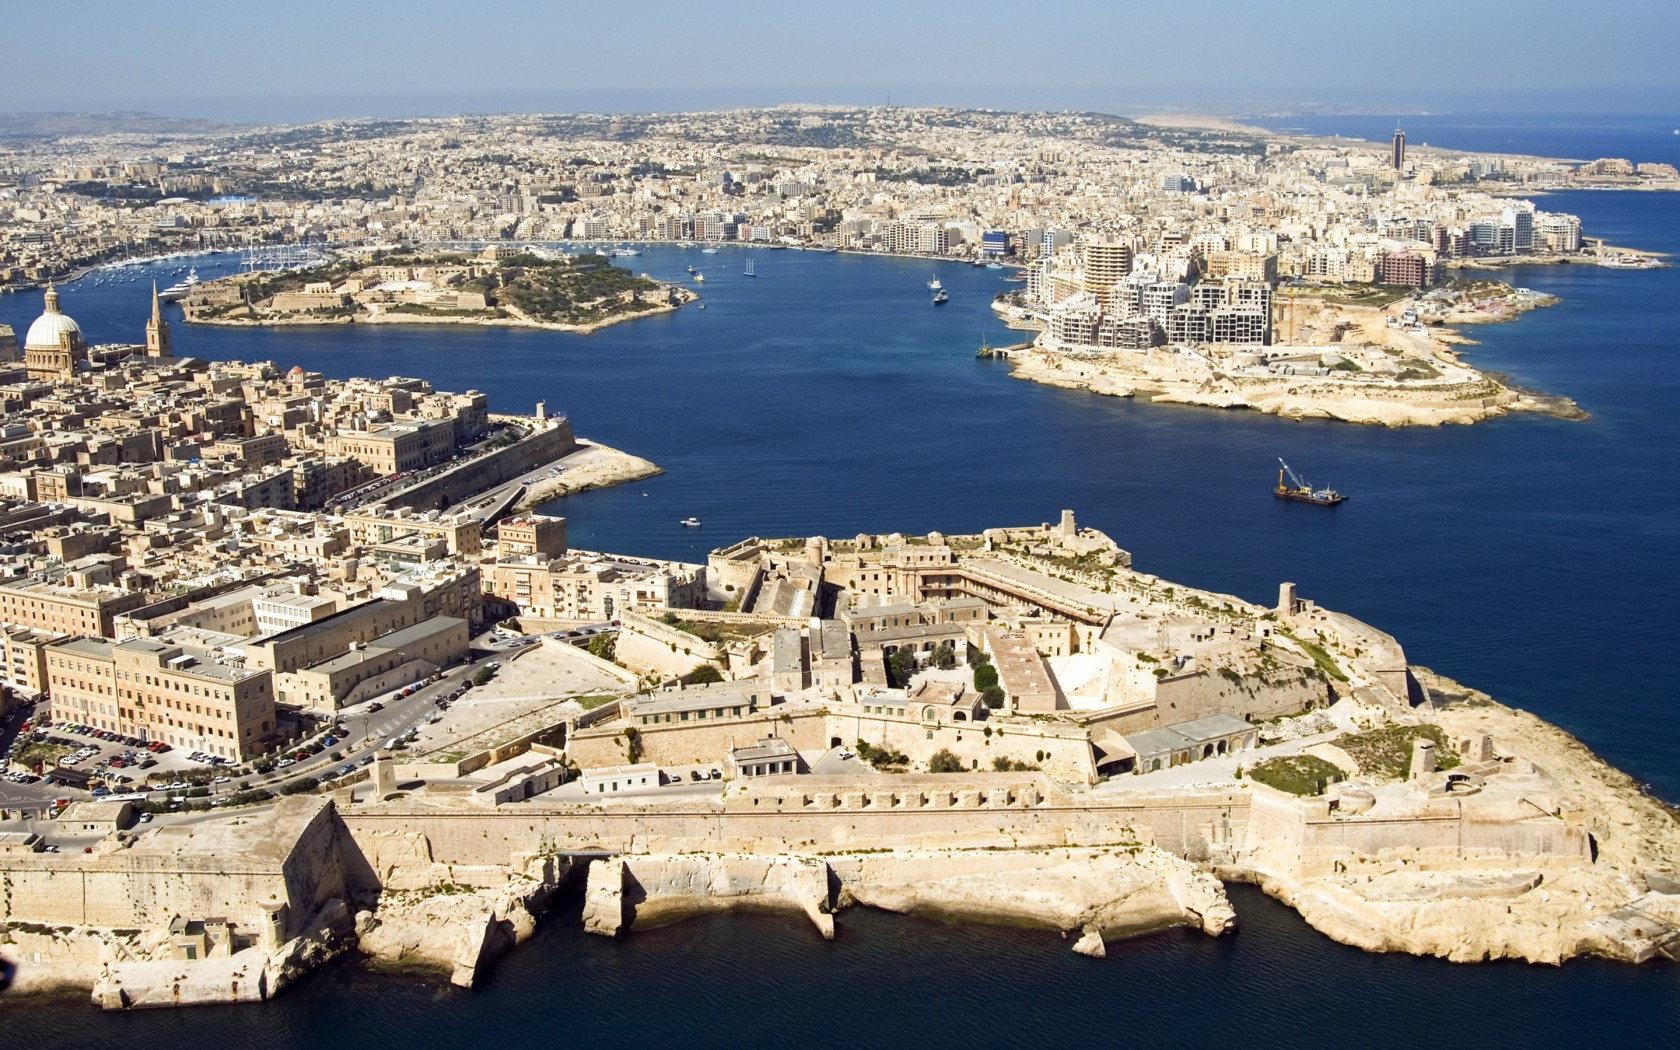 Game of Thrones Filming Location - Fort Manoel, Malta